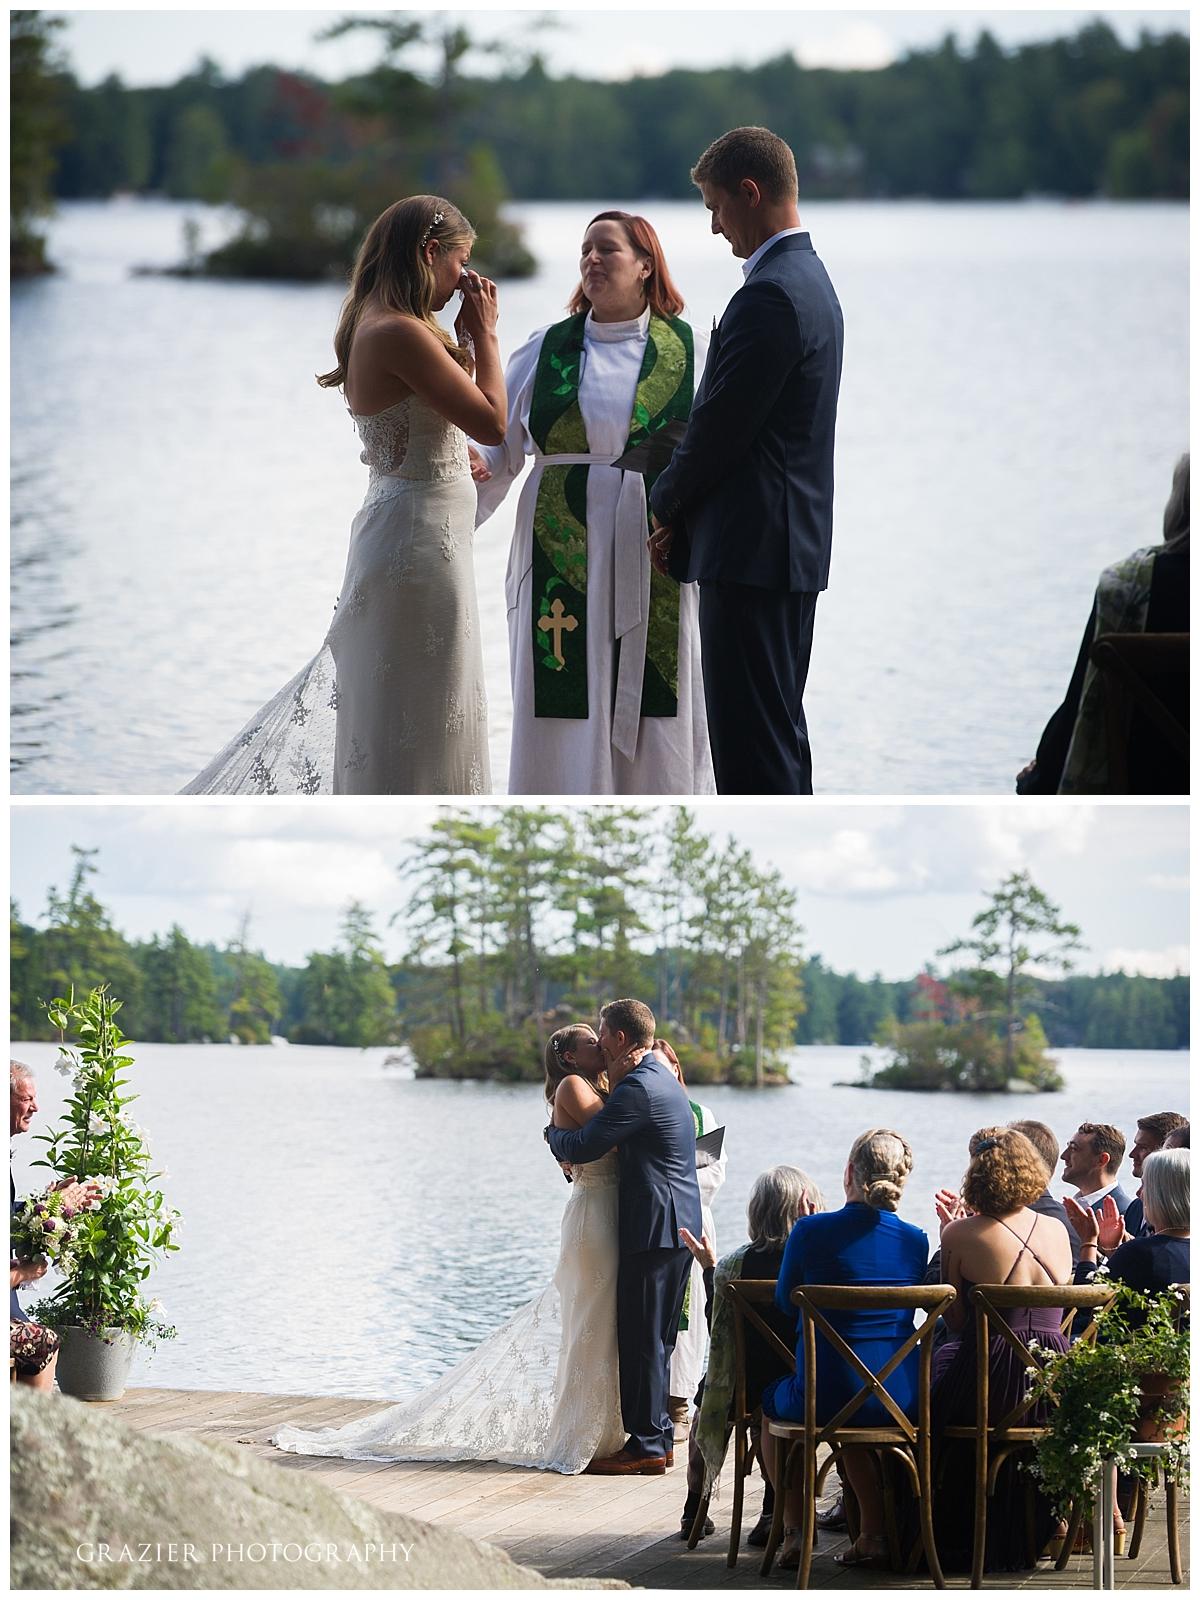 New Hampshire Lake Wedding Grazier Photography 170909-166_WEB.jpg